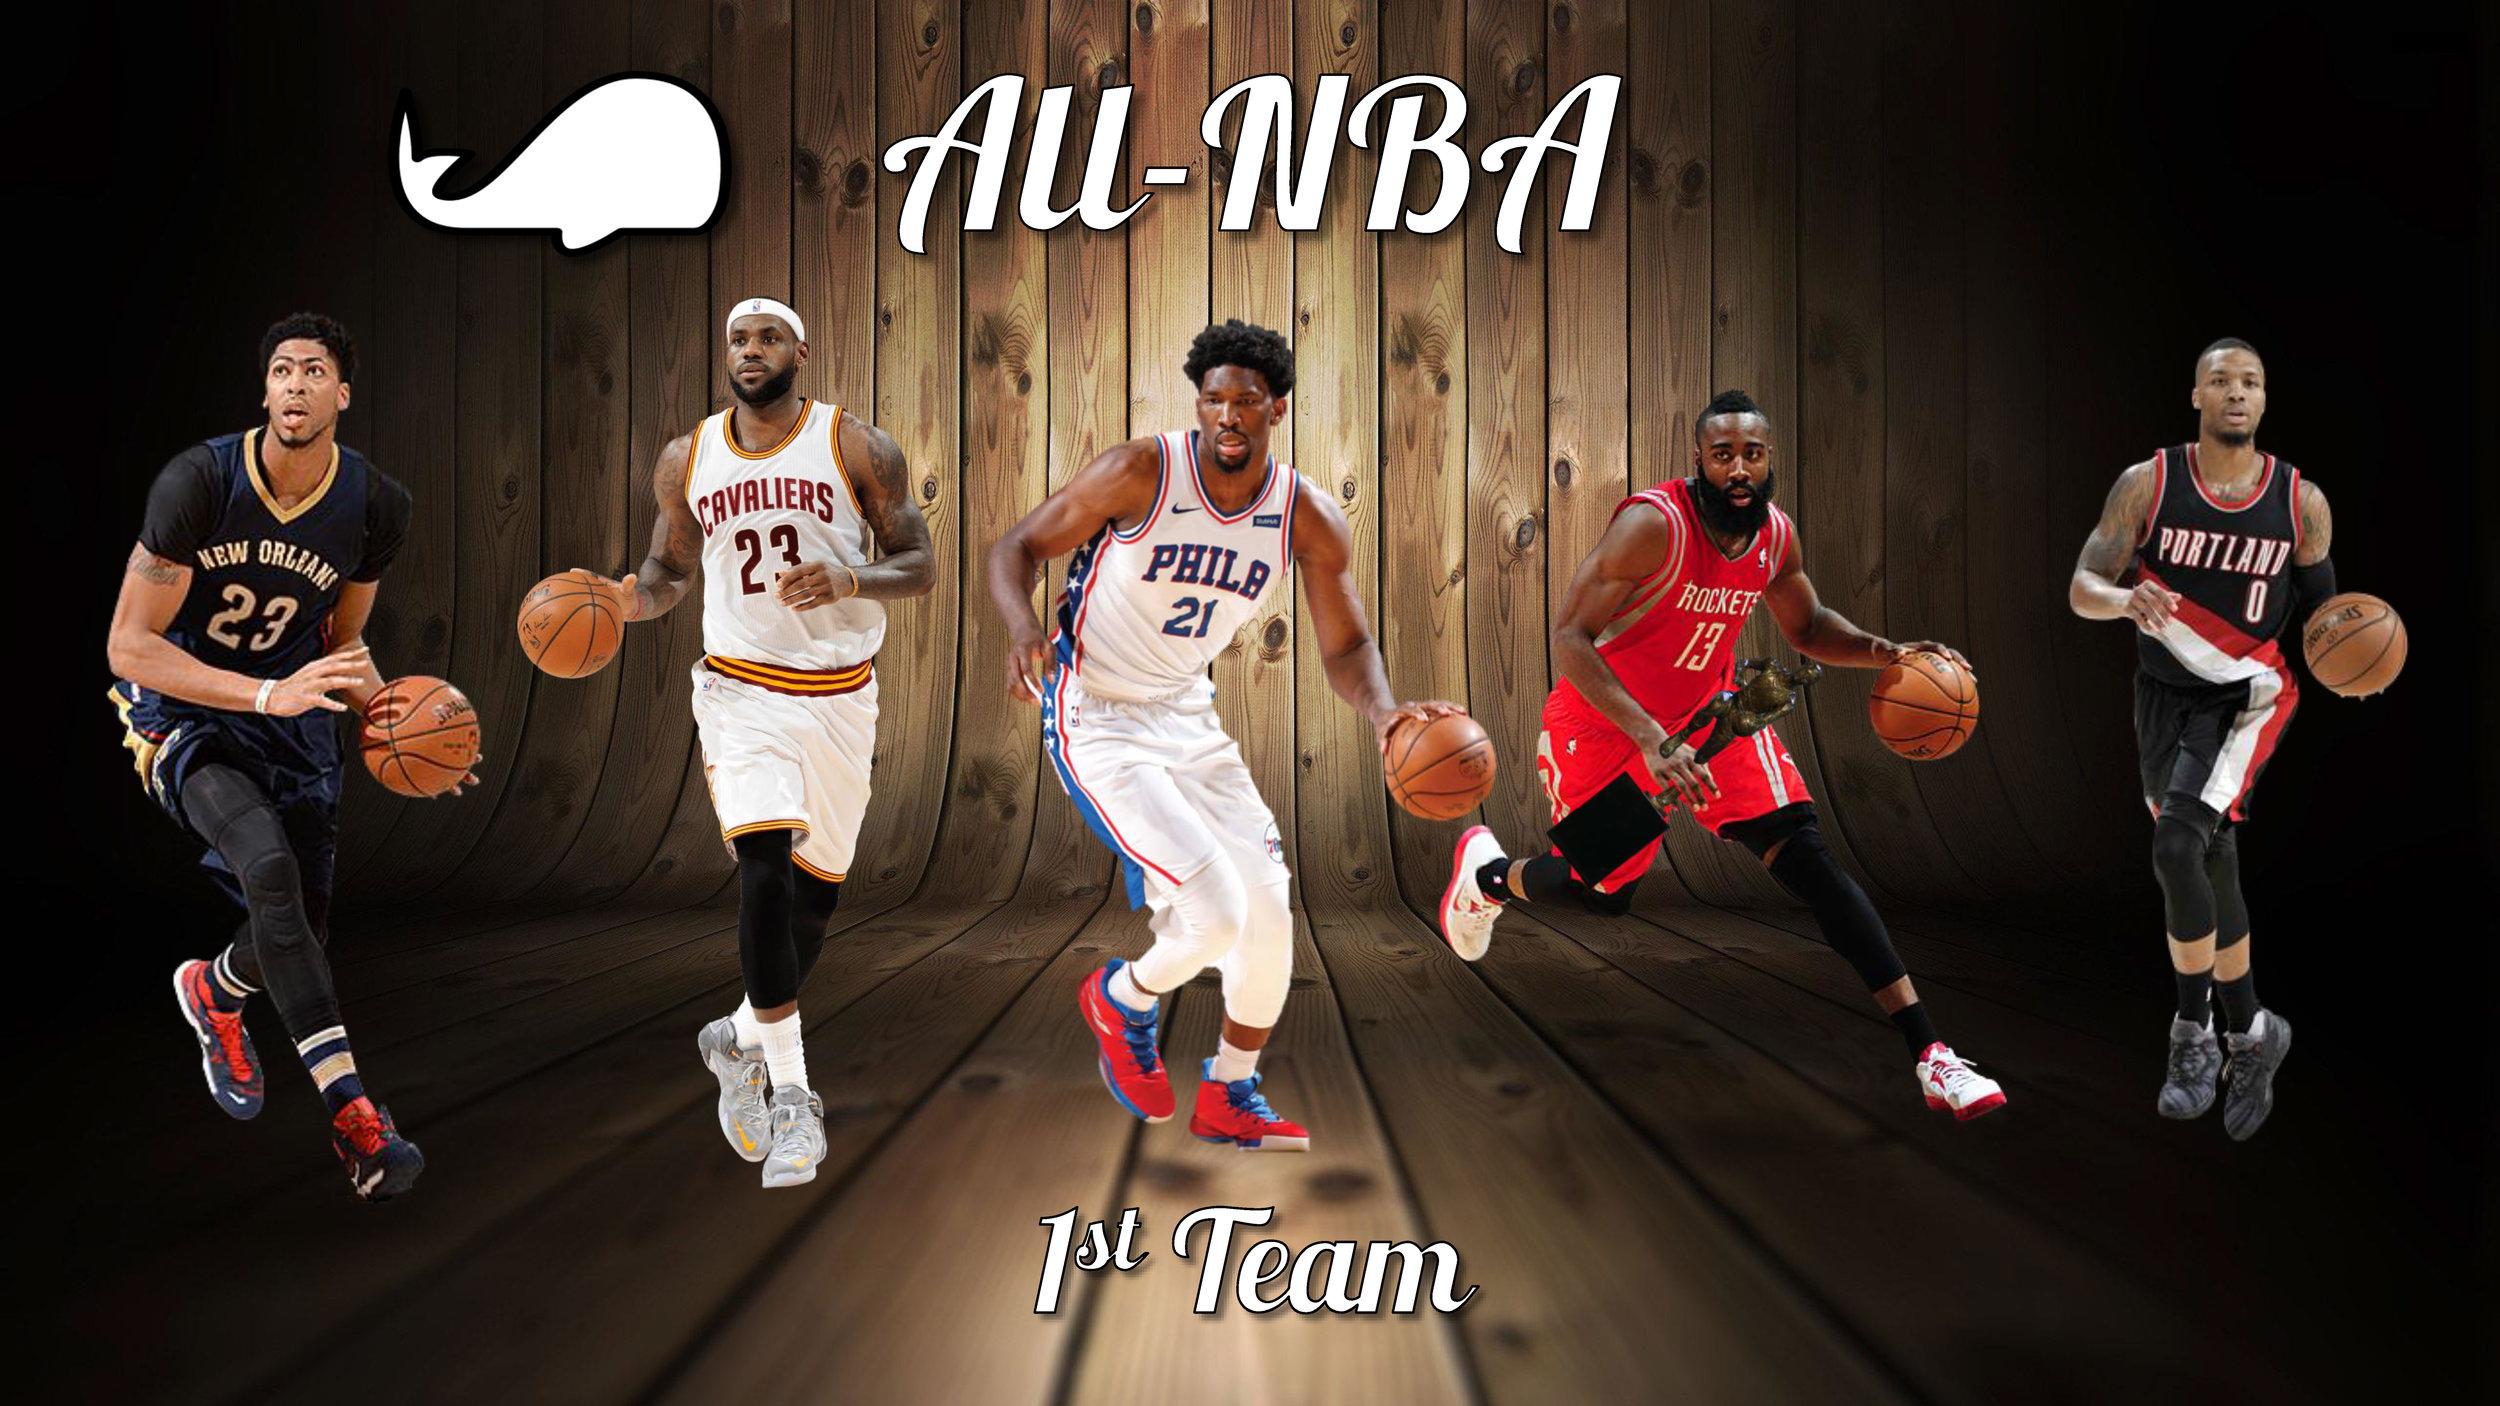 WW_2017_All_NBA_Page_1.jpg